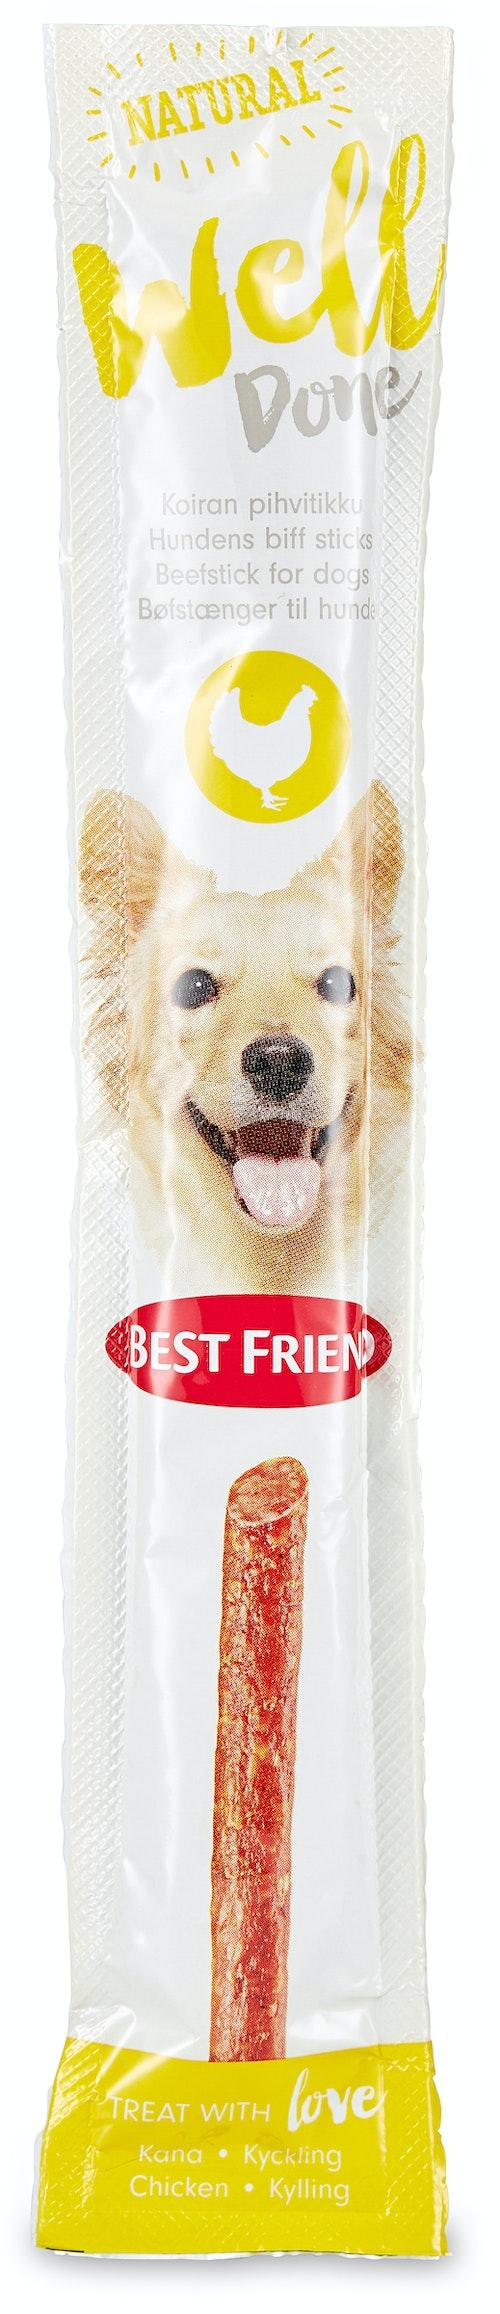 Best Friend Welldone Kylling Snack til Hund 15 g